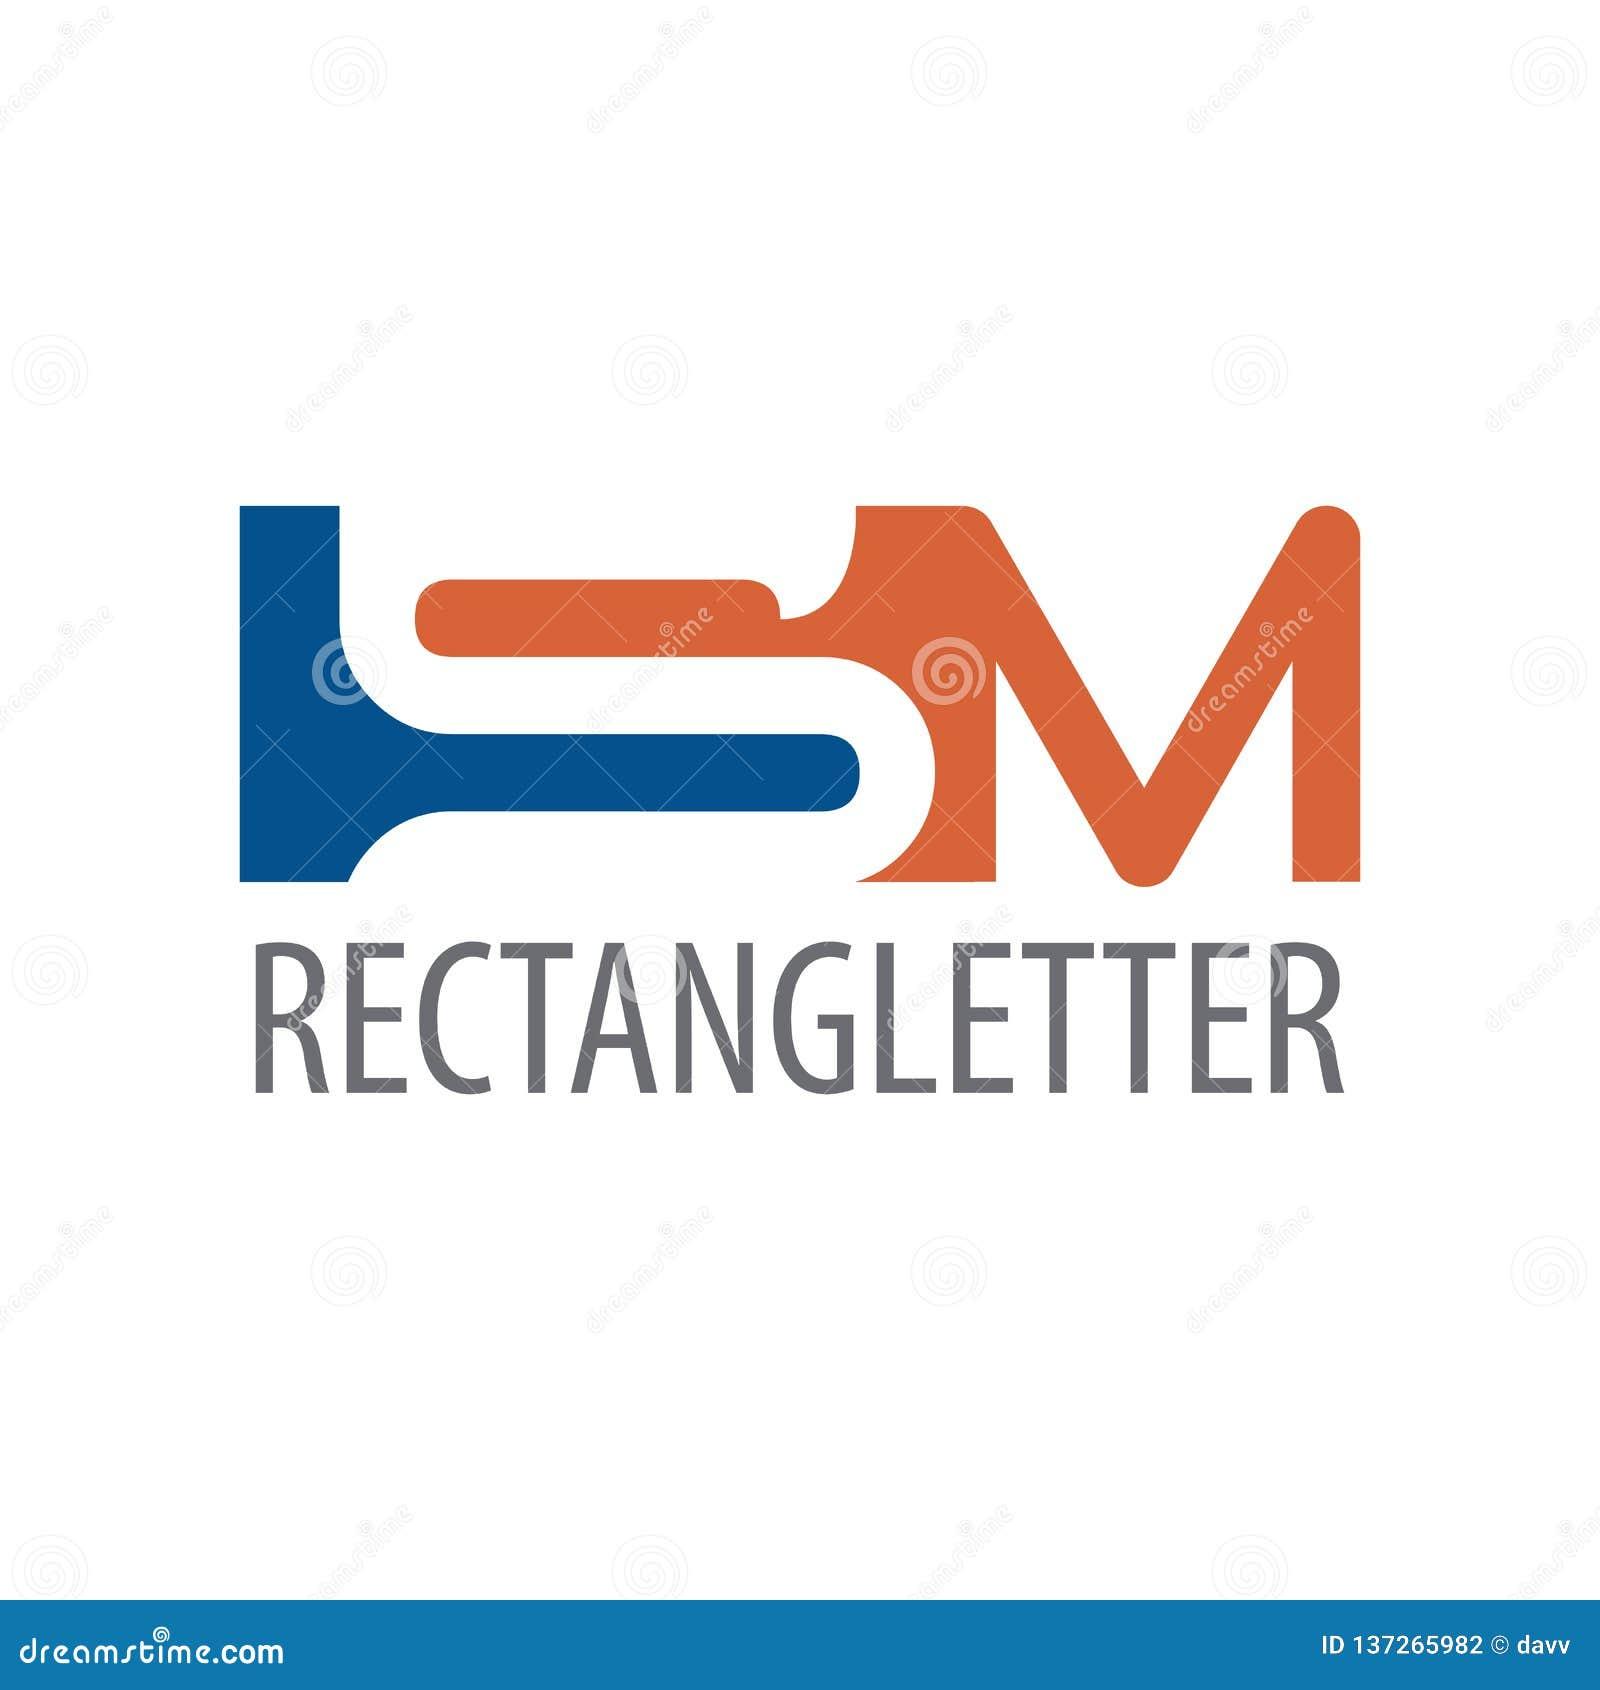 Rectangle initial letter SM logo concept design. Symbol graphic template element